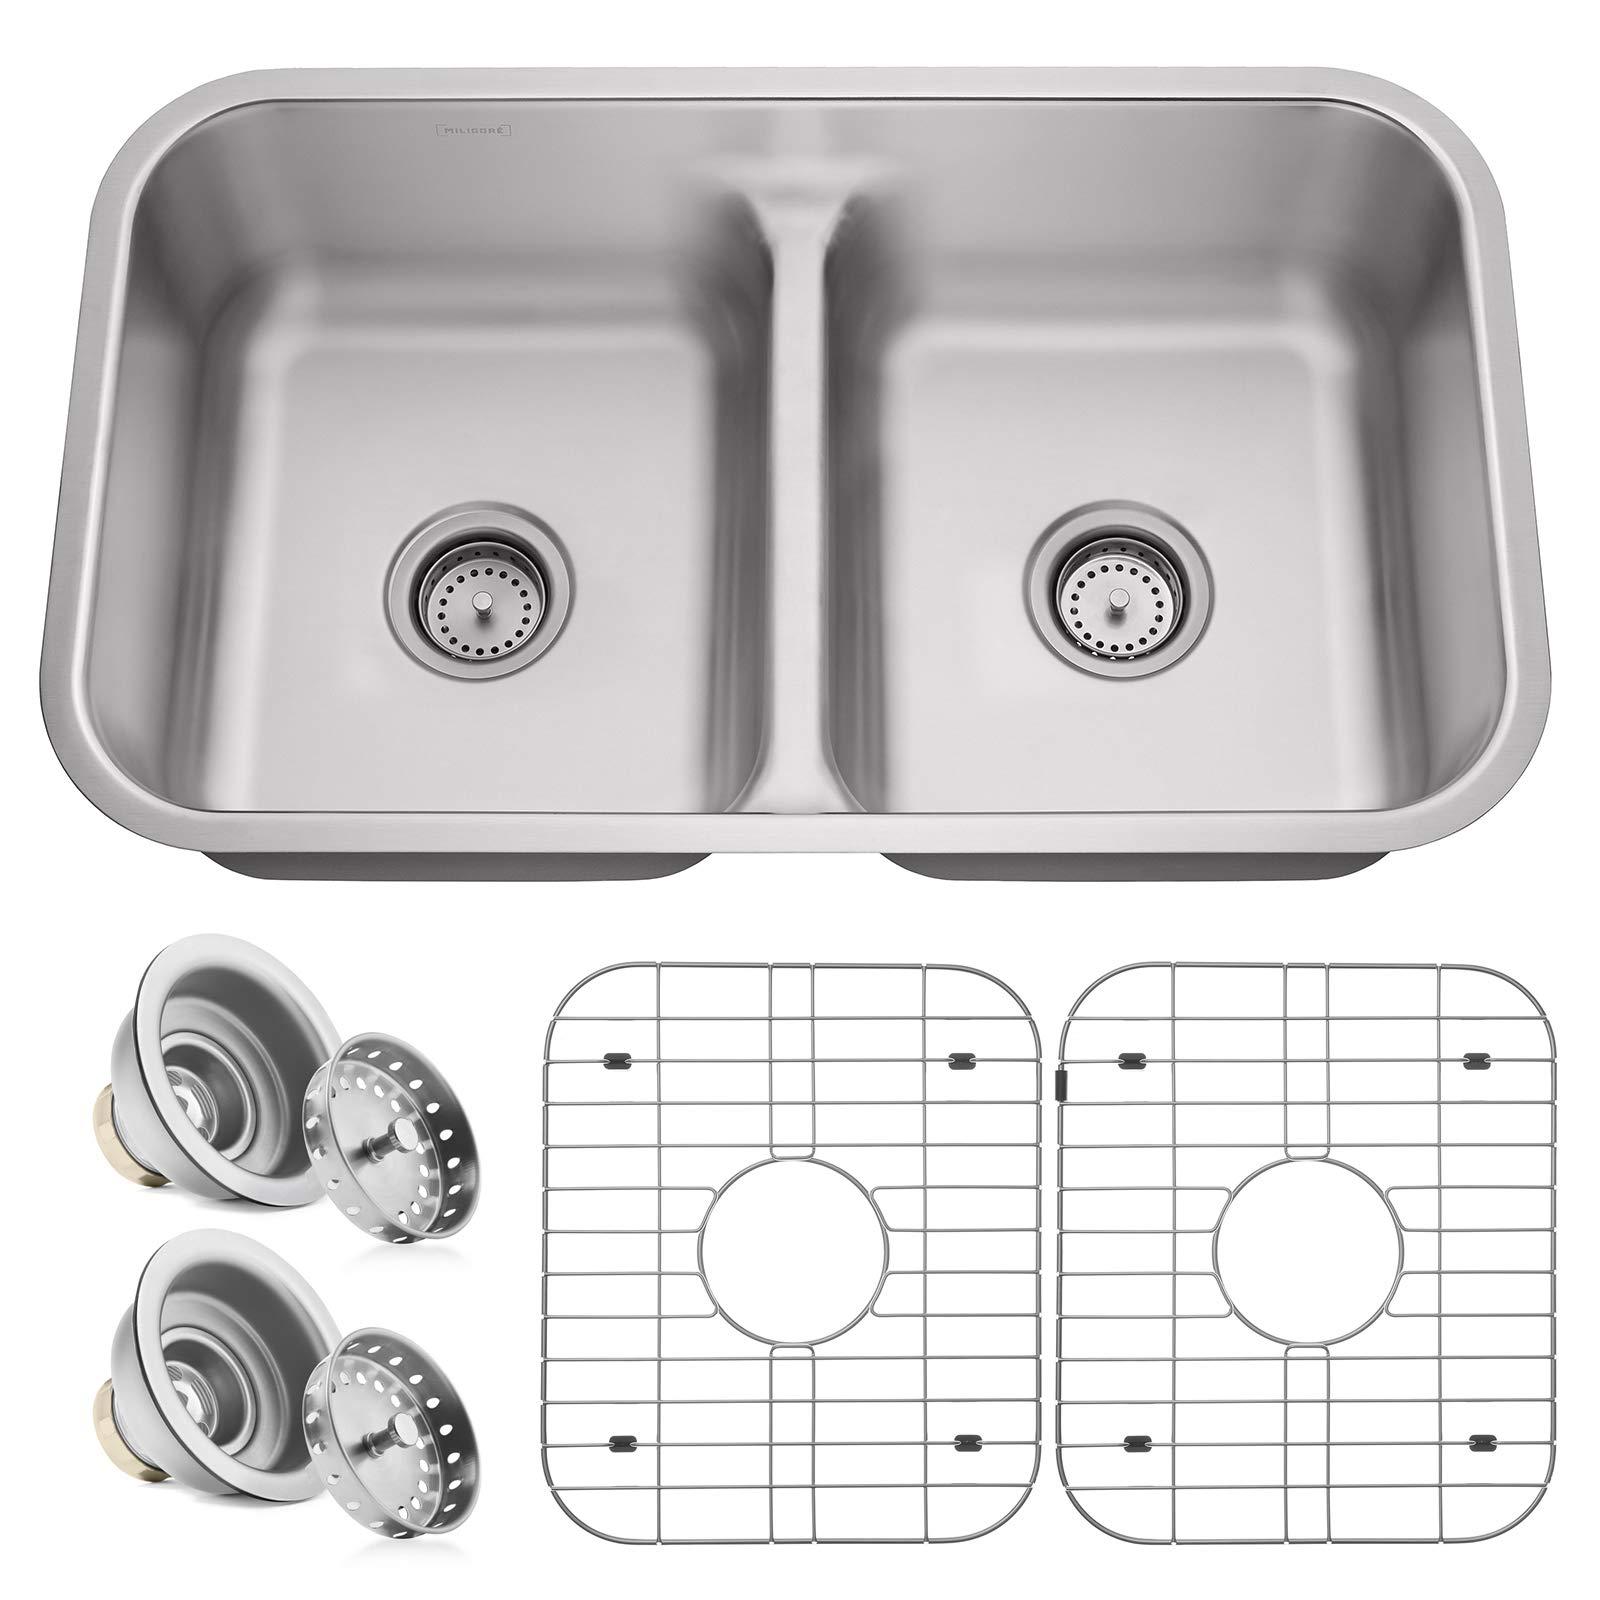 Miligore 32'' x 19'' x 9'' Deep Double Bowl (50/50 Low Profile Split) 16-Gauge Stainless Steel Kitchen Sink - Includes Drains/Grids